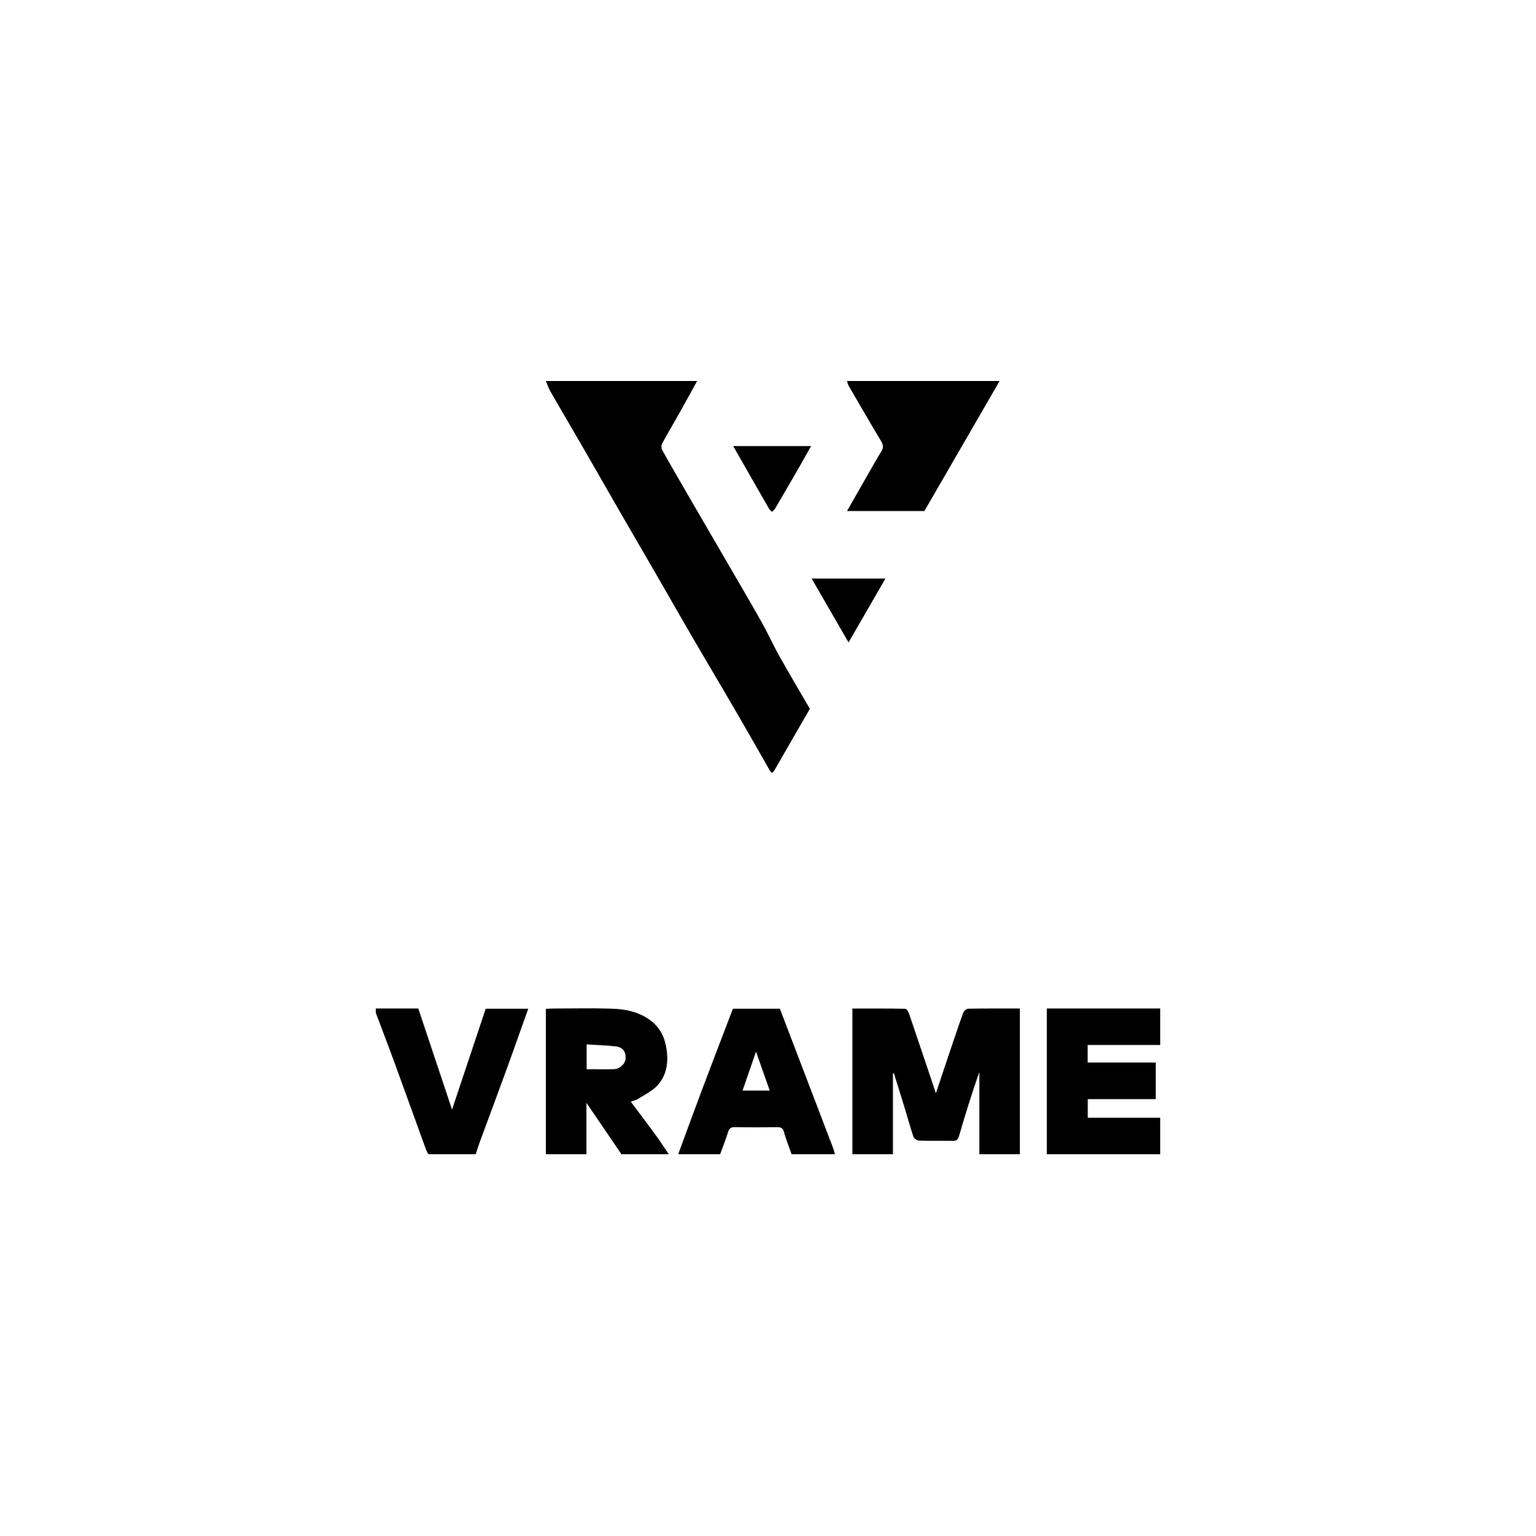 vrame_black_whitebg_001_preview